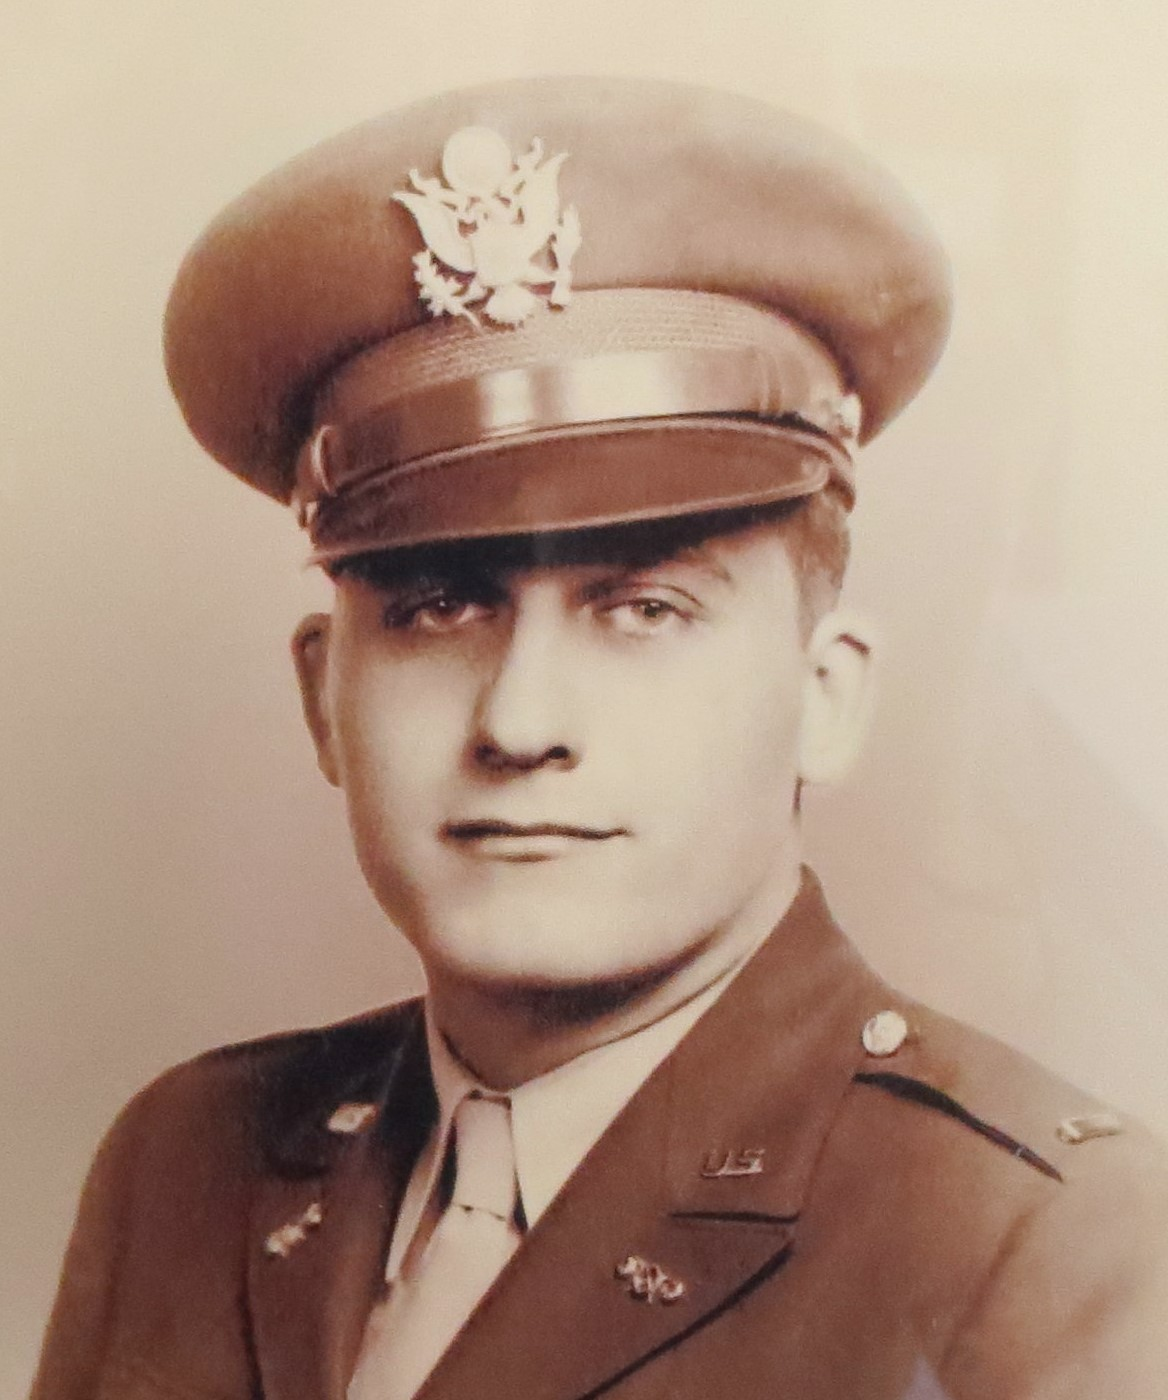 U.S. Army Capt. Walter J. Trock